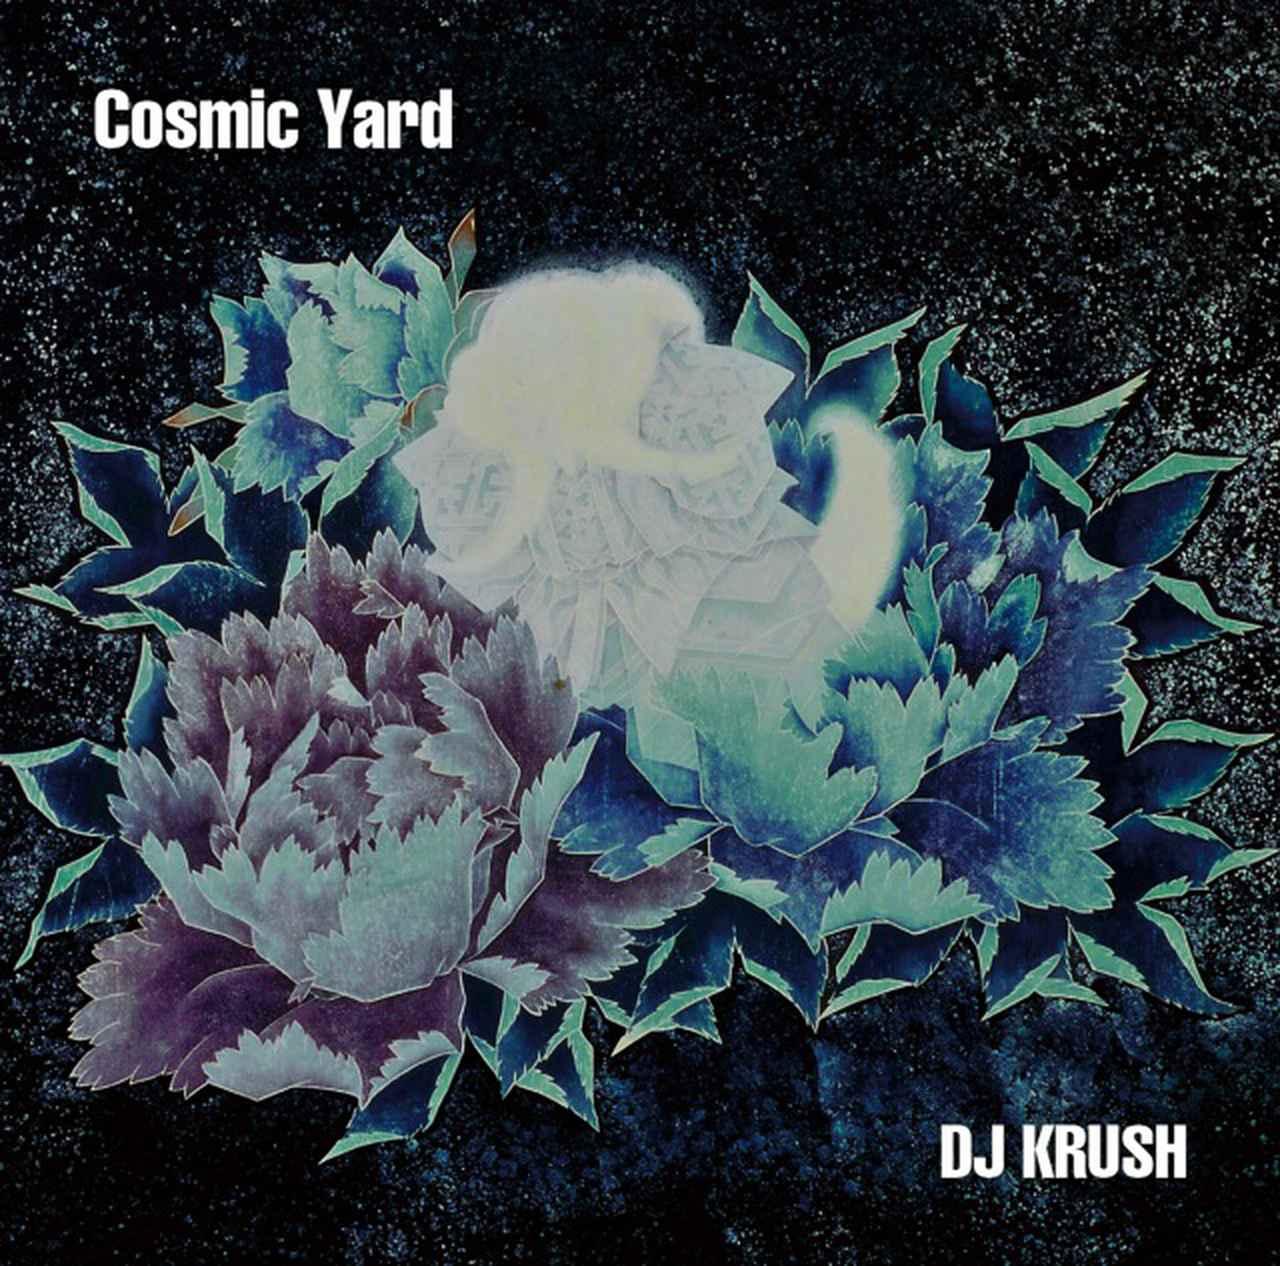 画像: Cosmic Yard(24bit/44.1kHz) / DJ KRUSH on OTOTOY Music Store